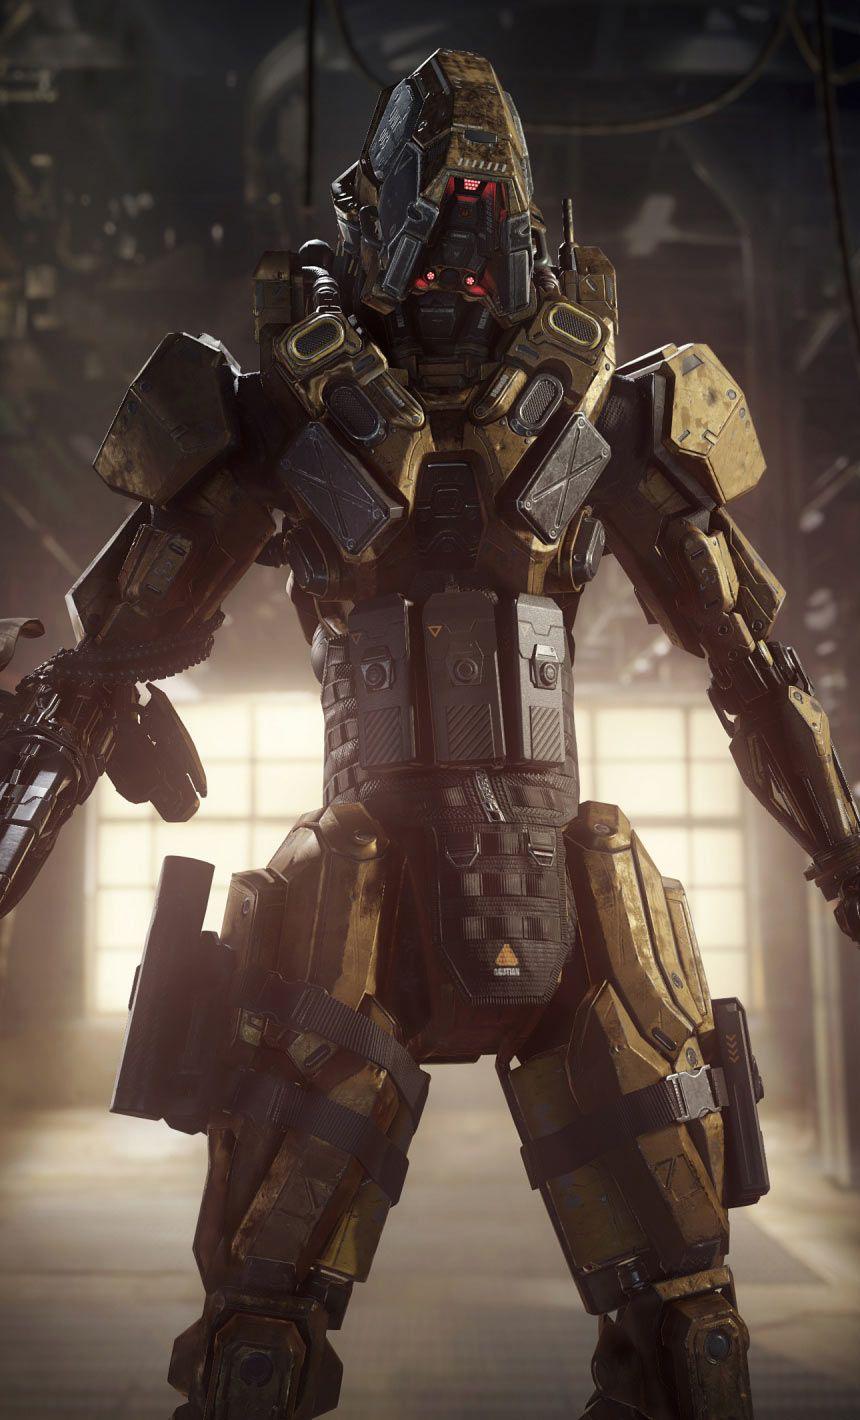 Games Hd Widescreen Wallpapers Call Of Duty Blackops 3 Specialist Reaper Wallpaper Http W Call Of Duty Black Ops 3 Call Of Duty Black Call Of Duty Ghosts